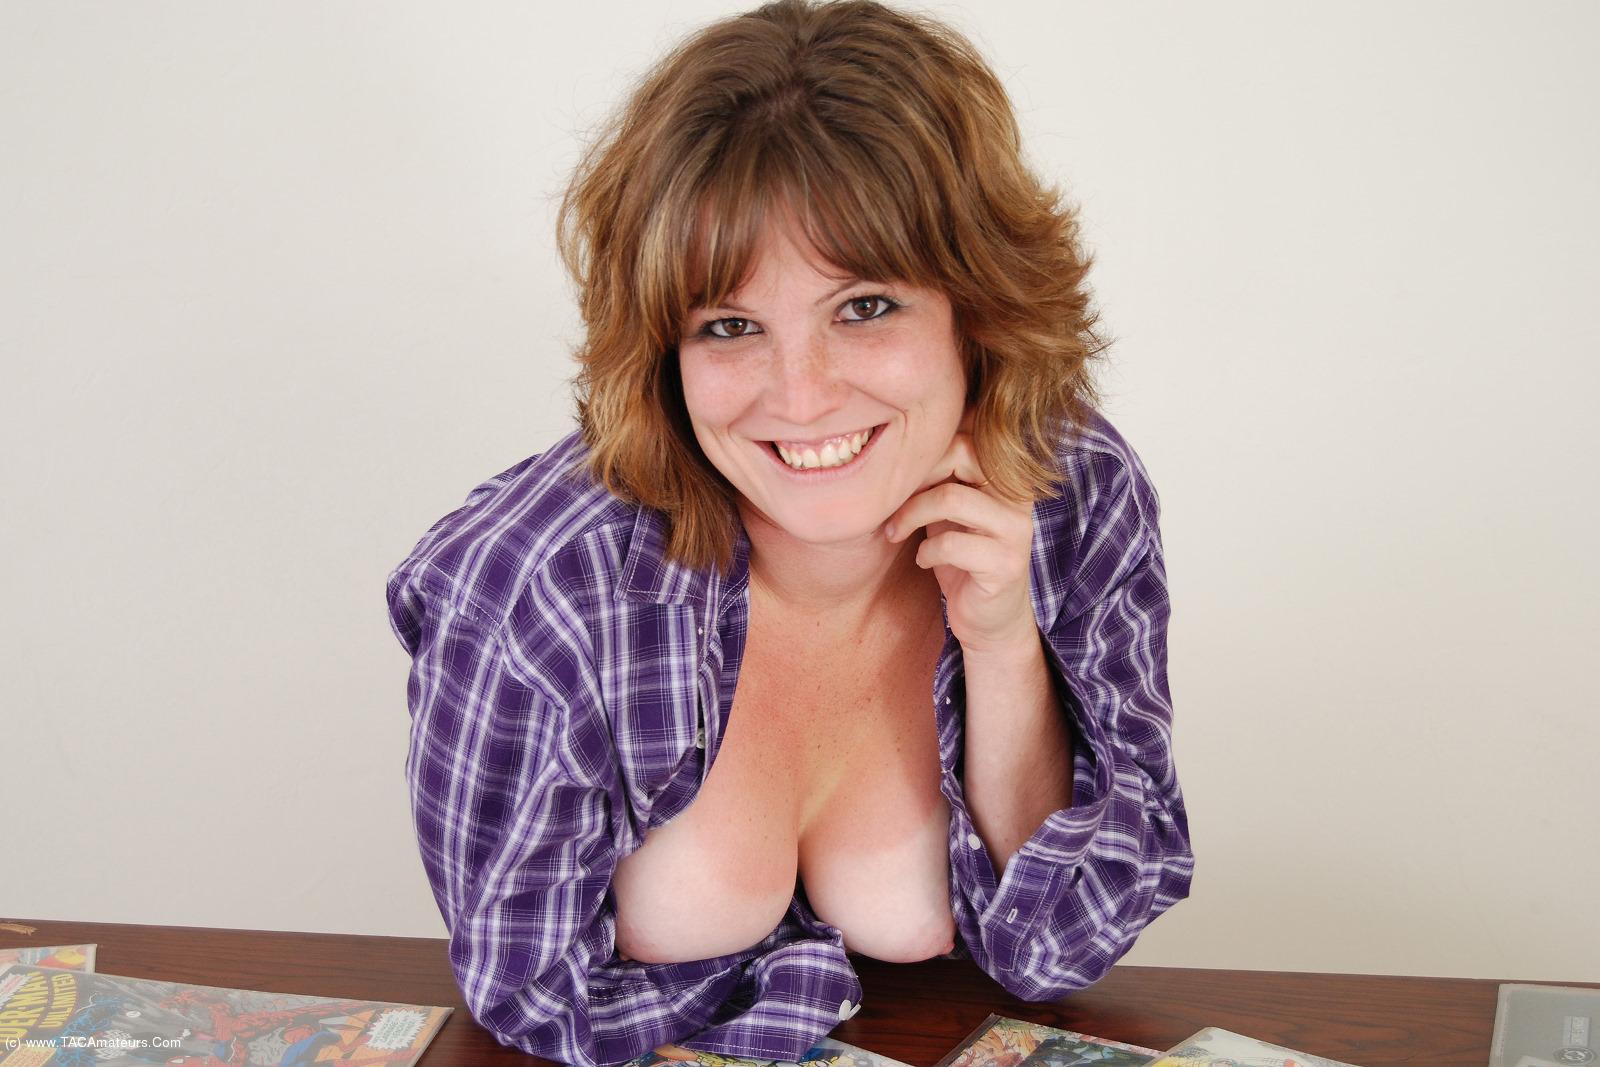 MistyB - Tits and comic books video scene 1